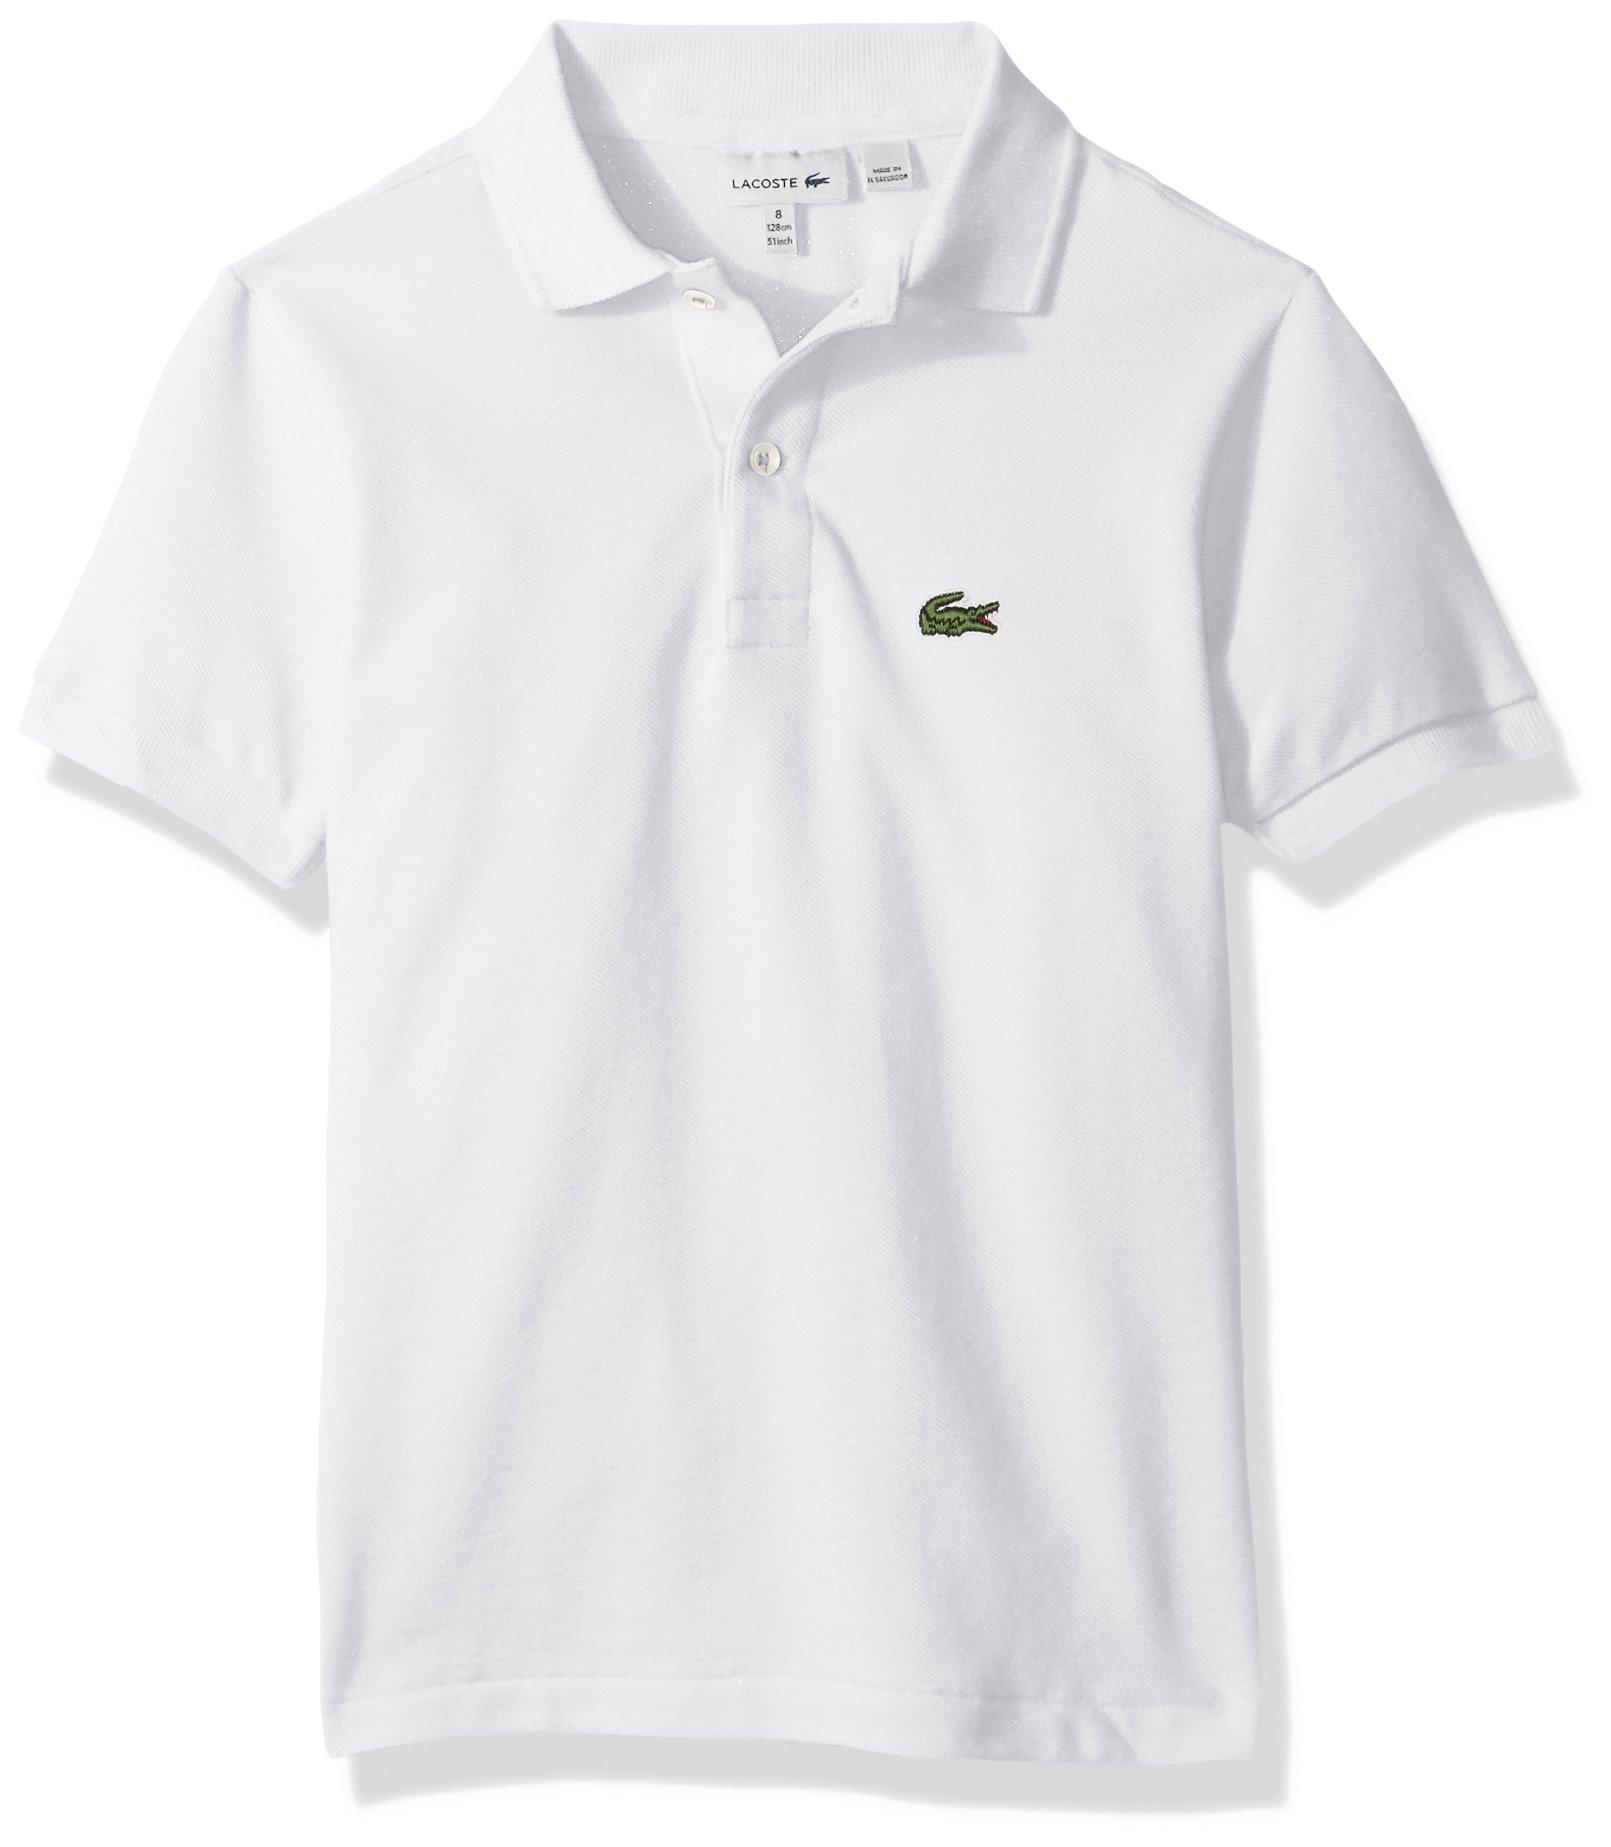 fae4fac2f Galleon - Lacoste Little Boys' (l1812) Short Sleeve Classic Pique Polo  Shirt, White, 4